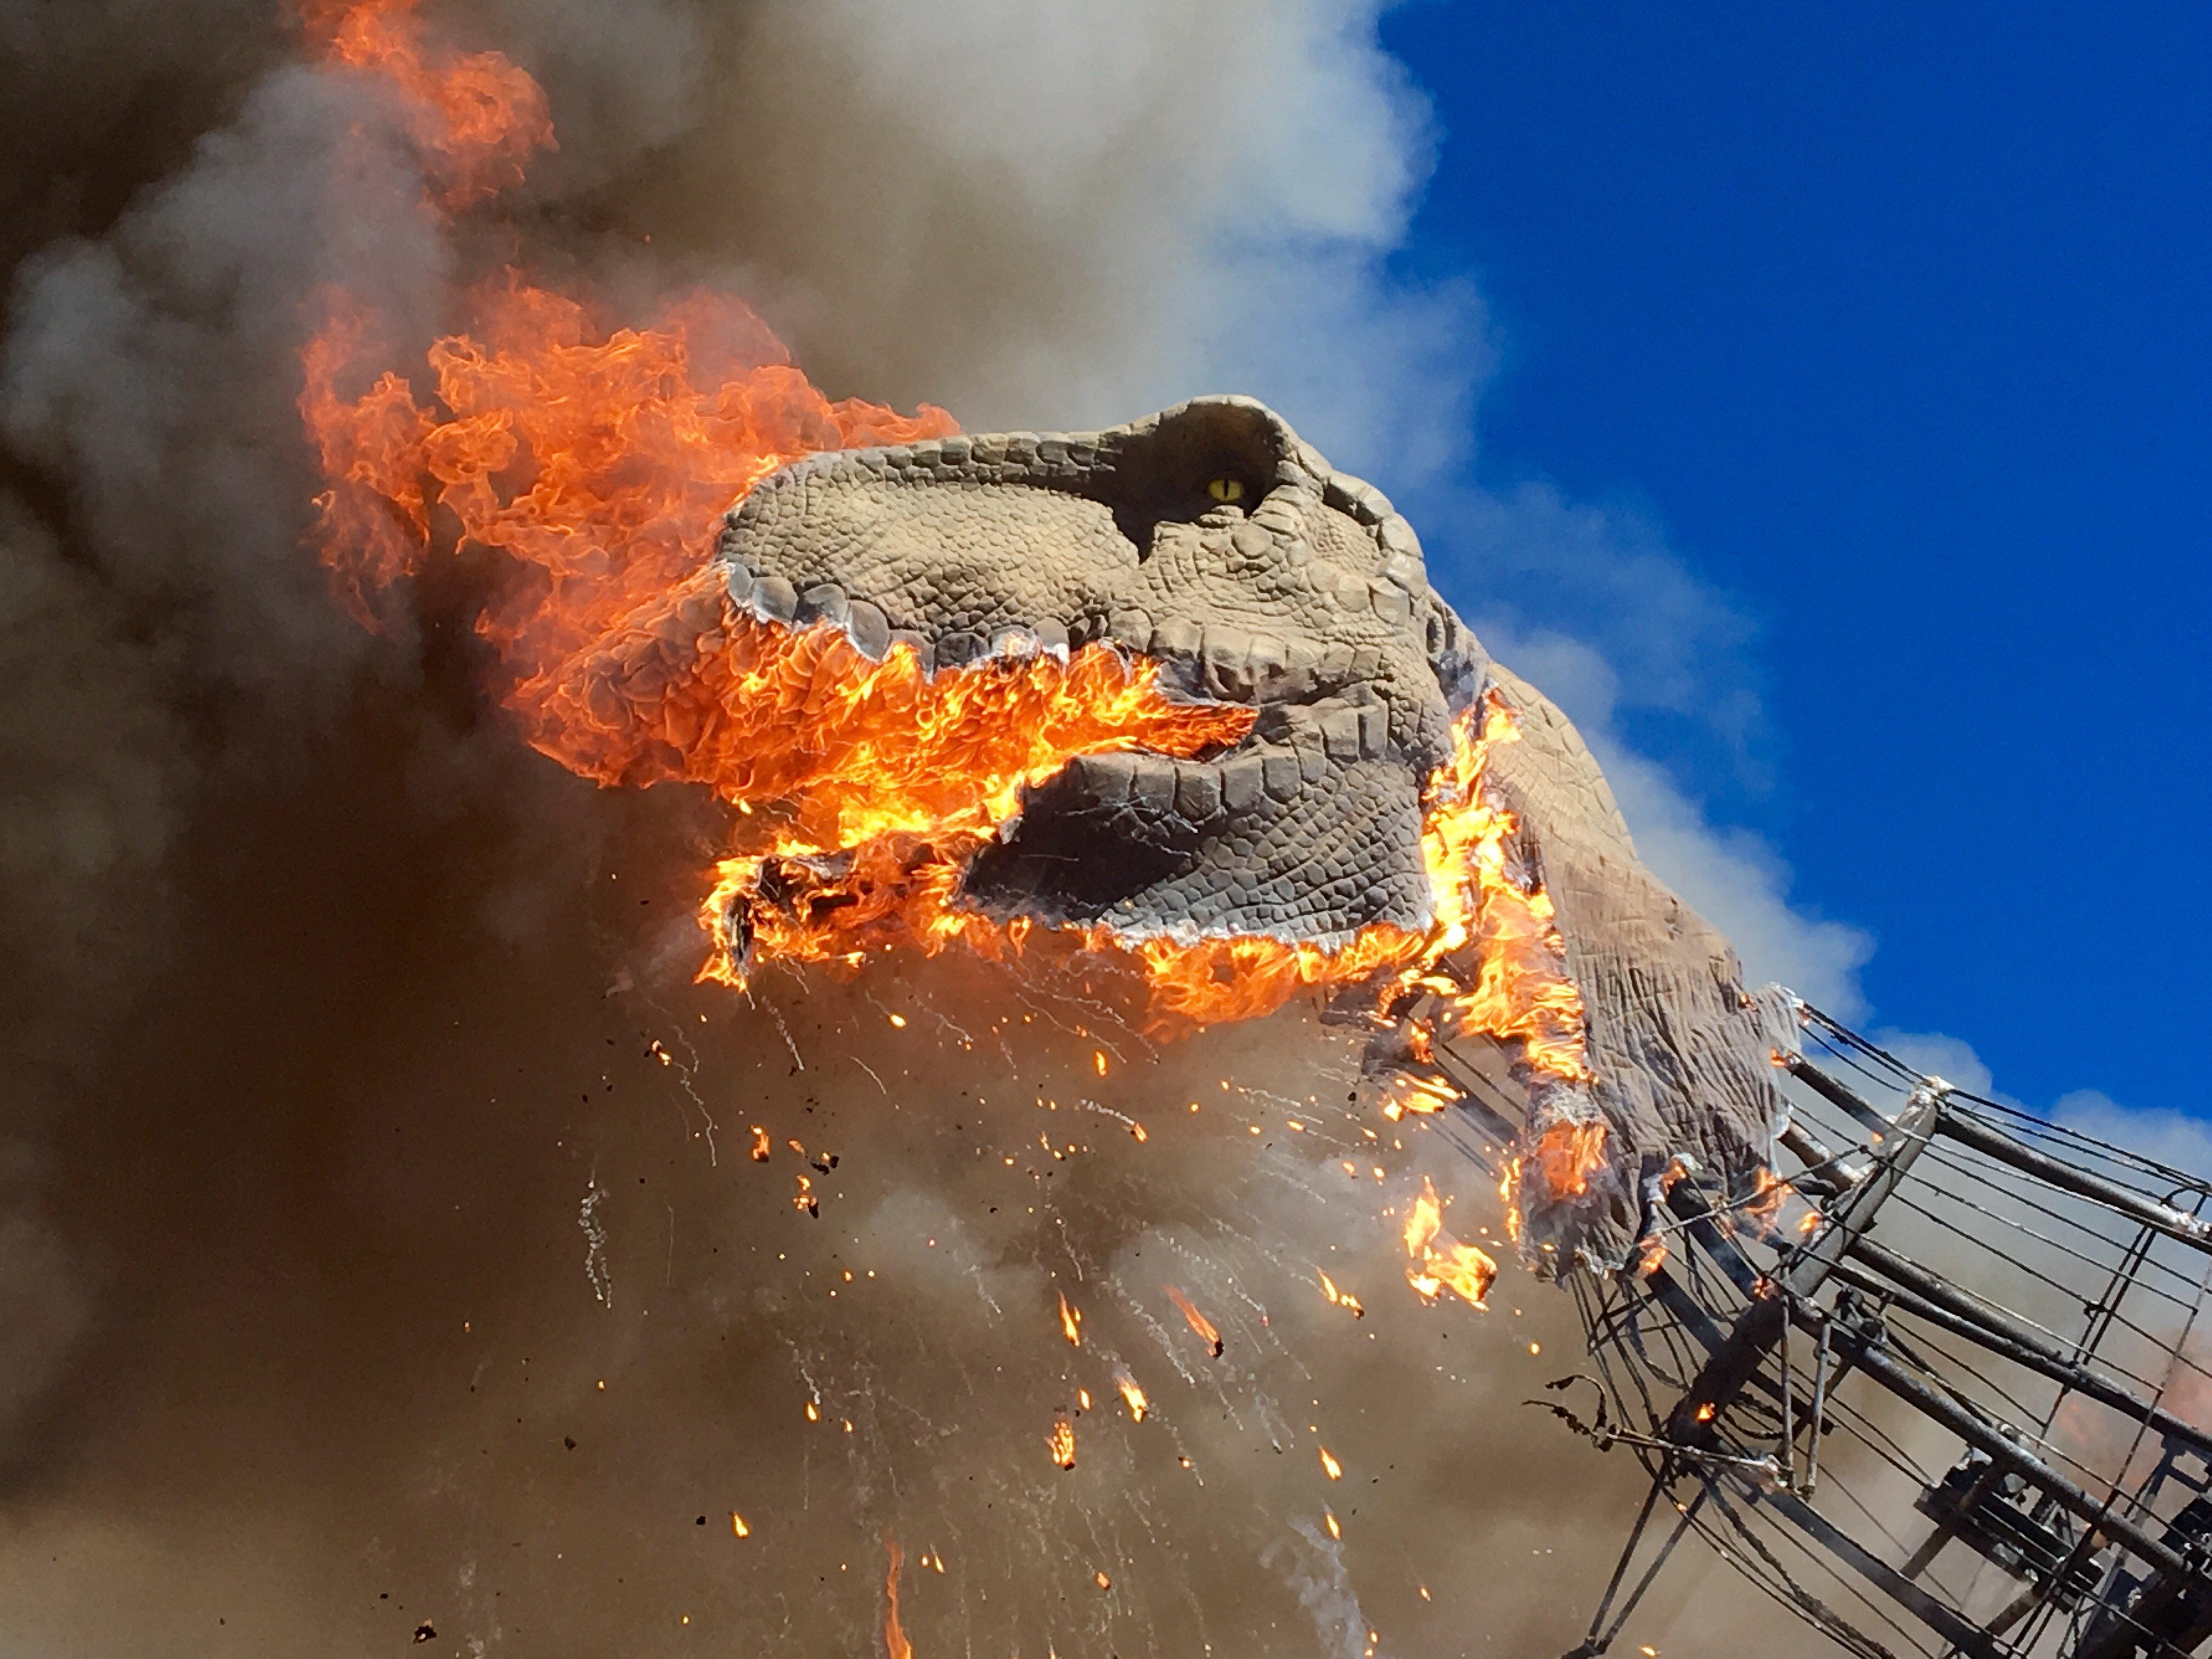 Watch T. rex burst into flames at dino park - CNN Video